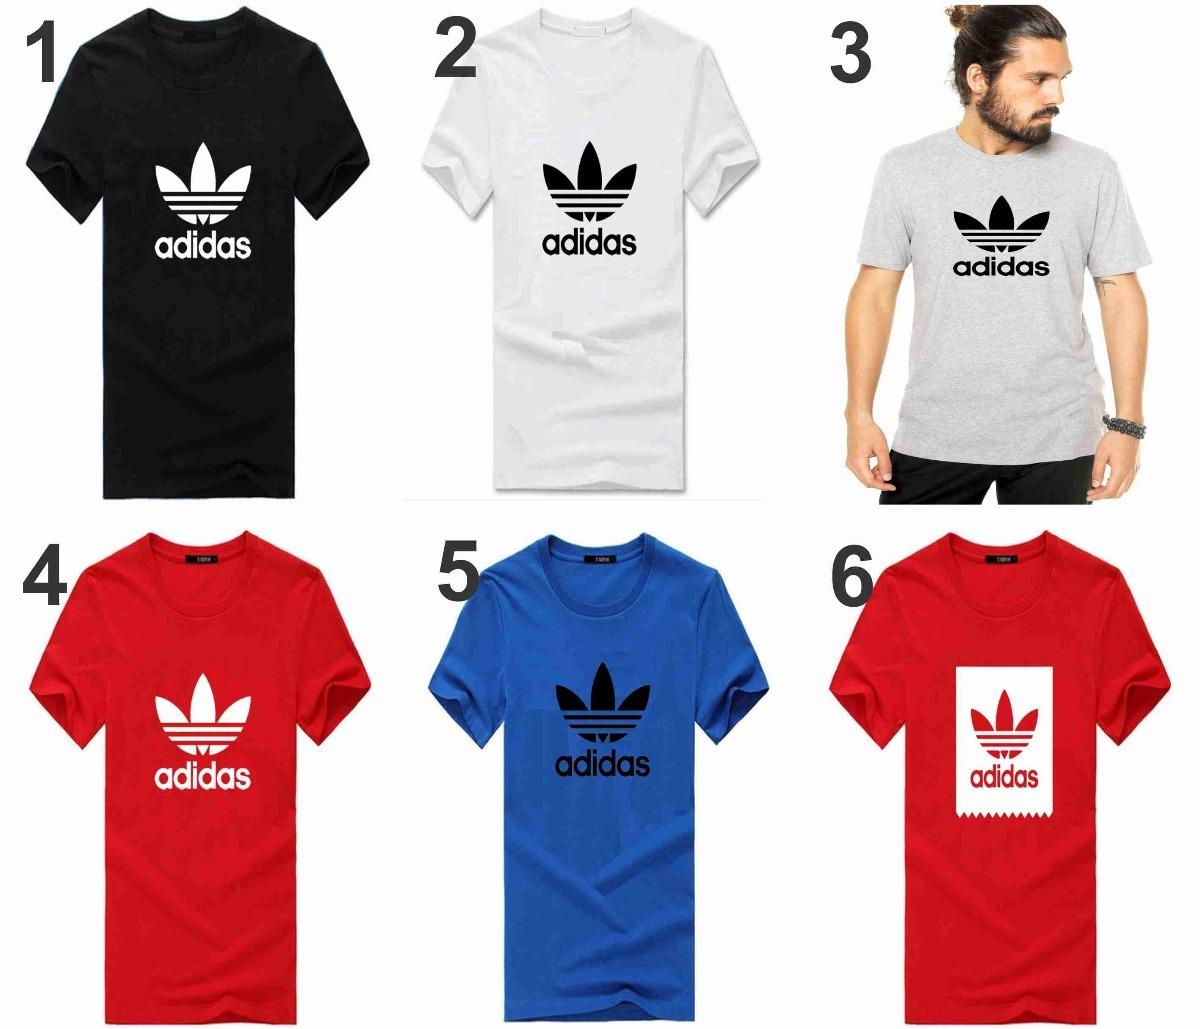 47872de33926c kit c 10 camisetas camisa masculina de marca atacado revenda. Carregando  zoom.